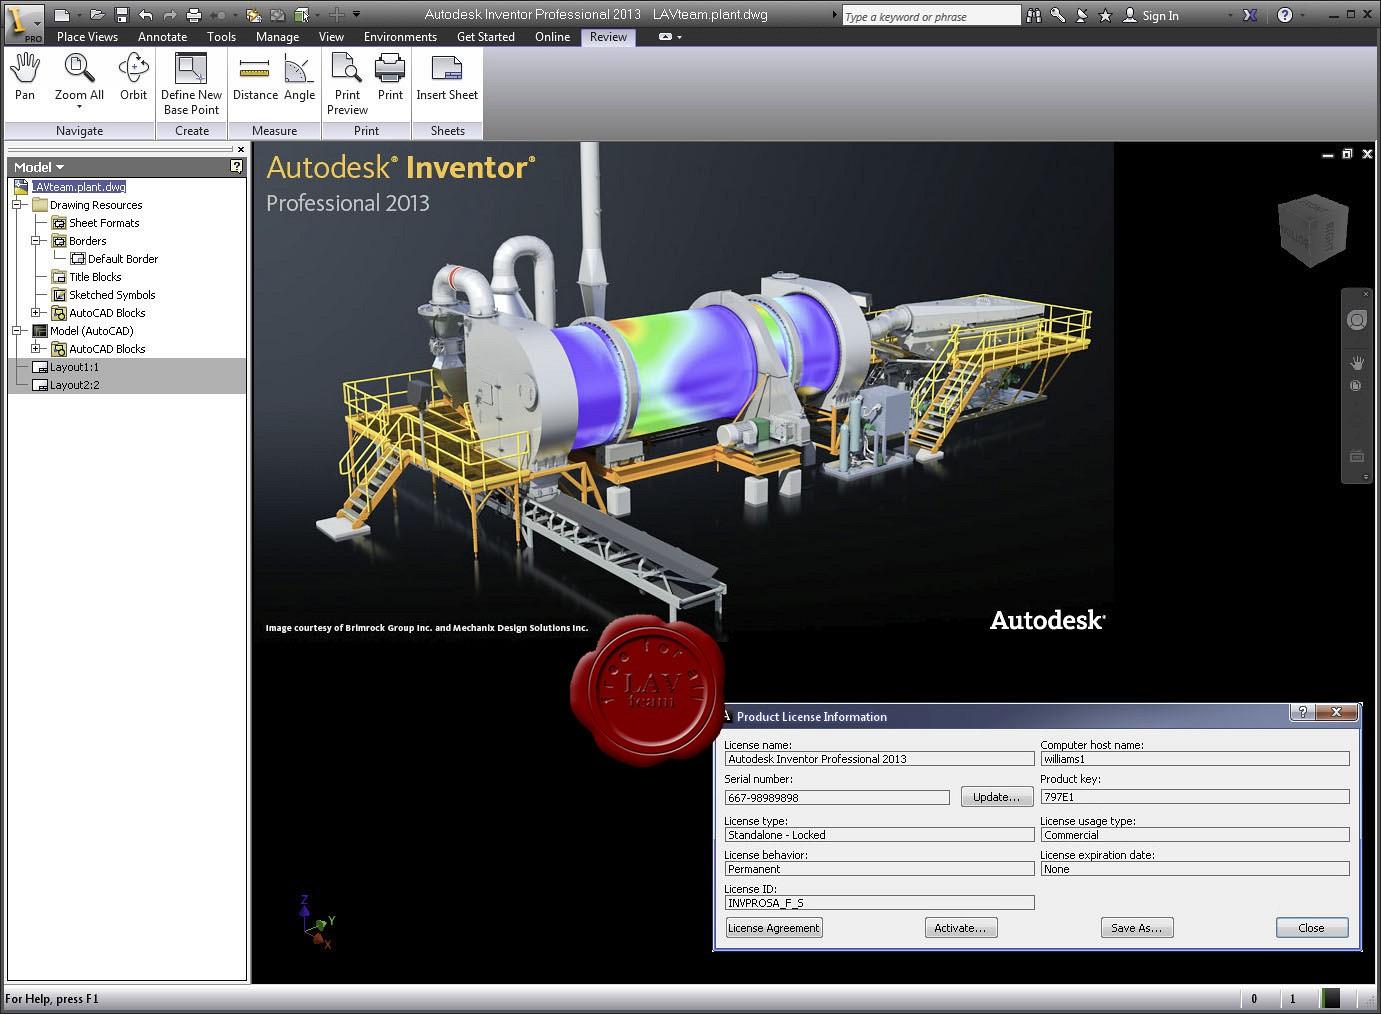 Buy Autodesk Inventor Pro 2013 64-bit download for Windows